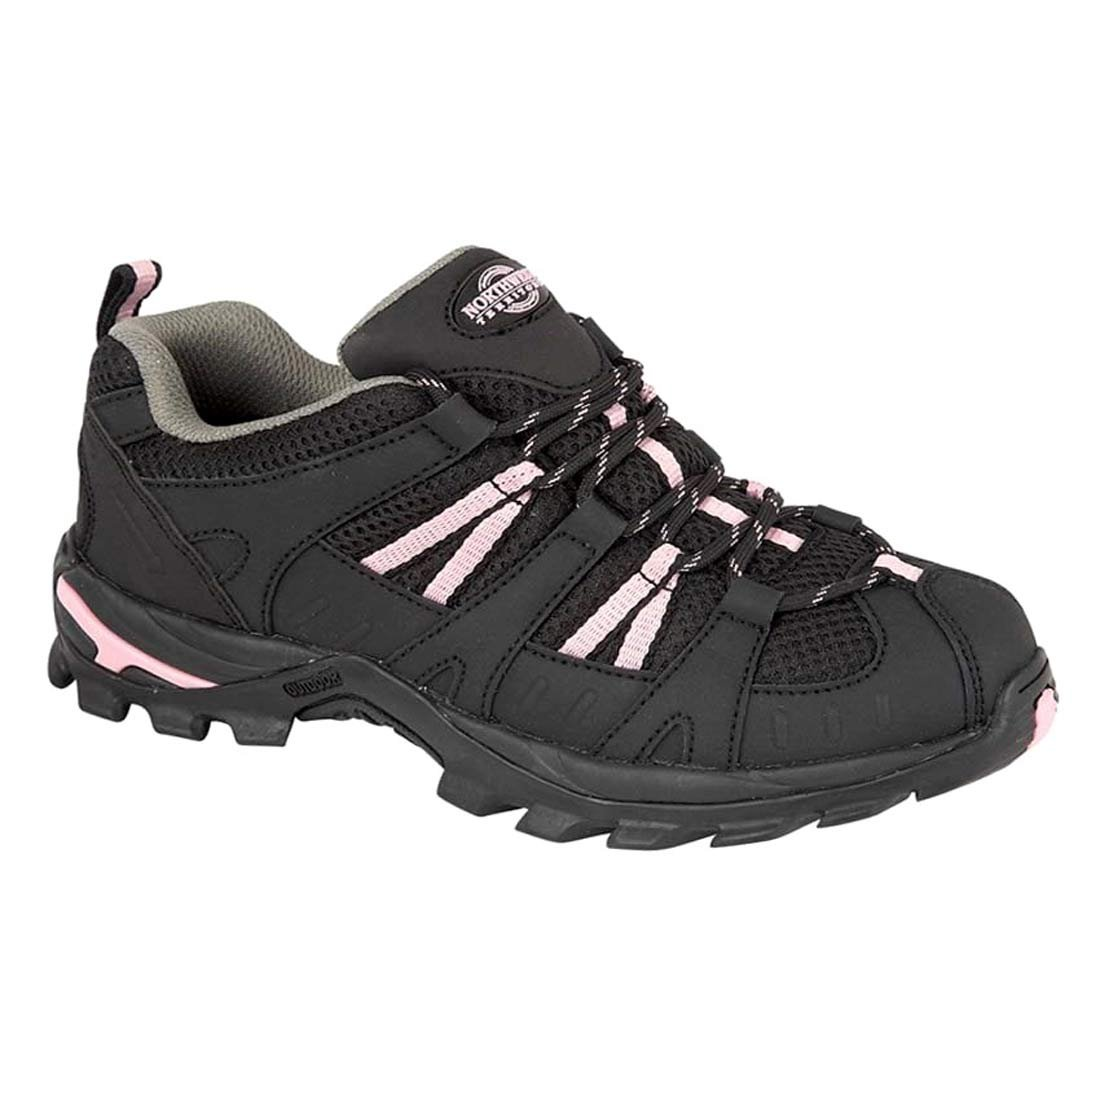 Northwest Territory Ladies Montana//Pino Totalmente Impermeable Senderismo//Senderismo Cordones Trainer Shoe